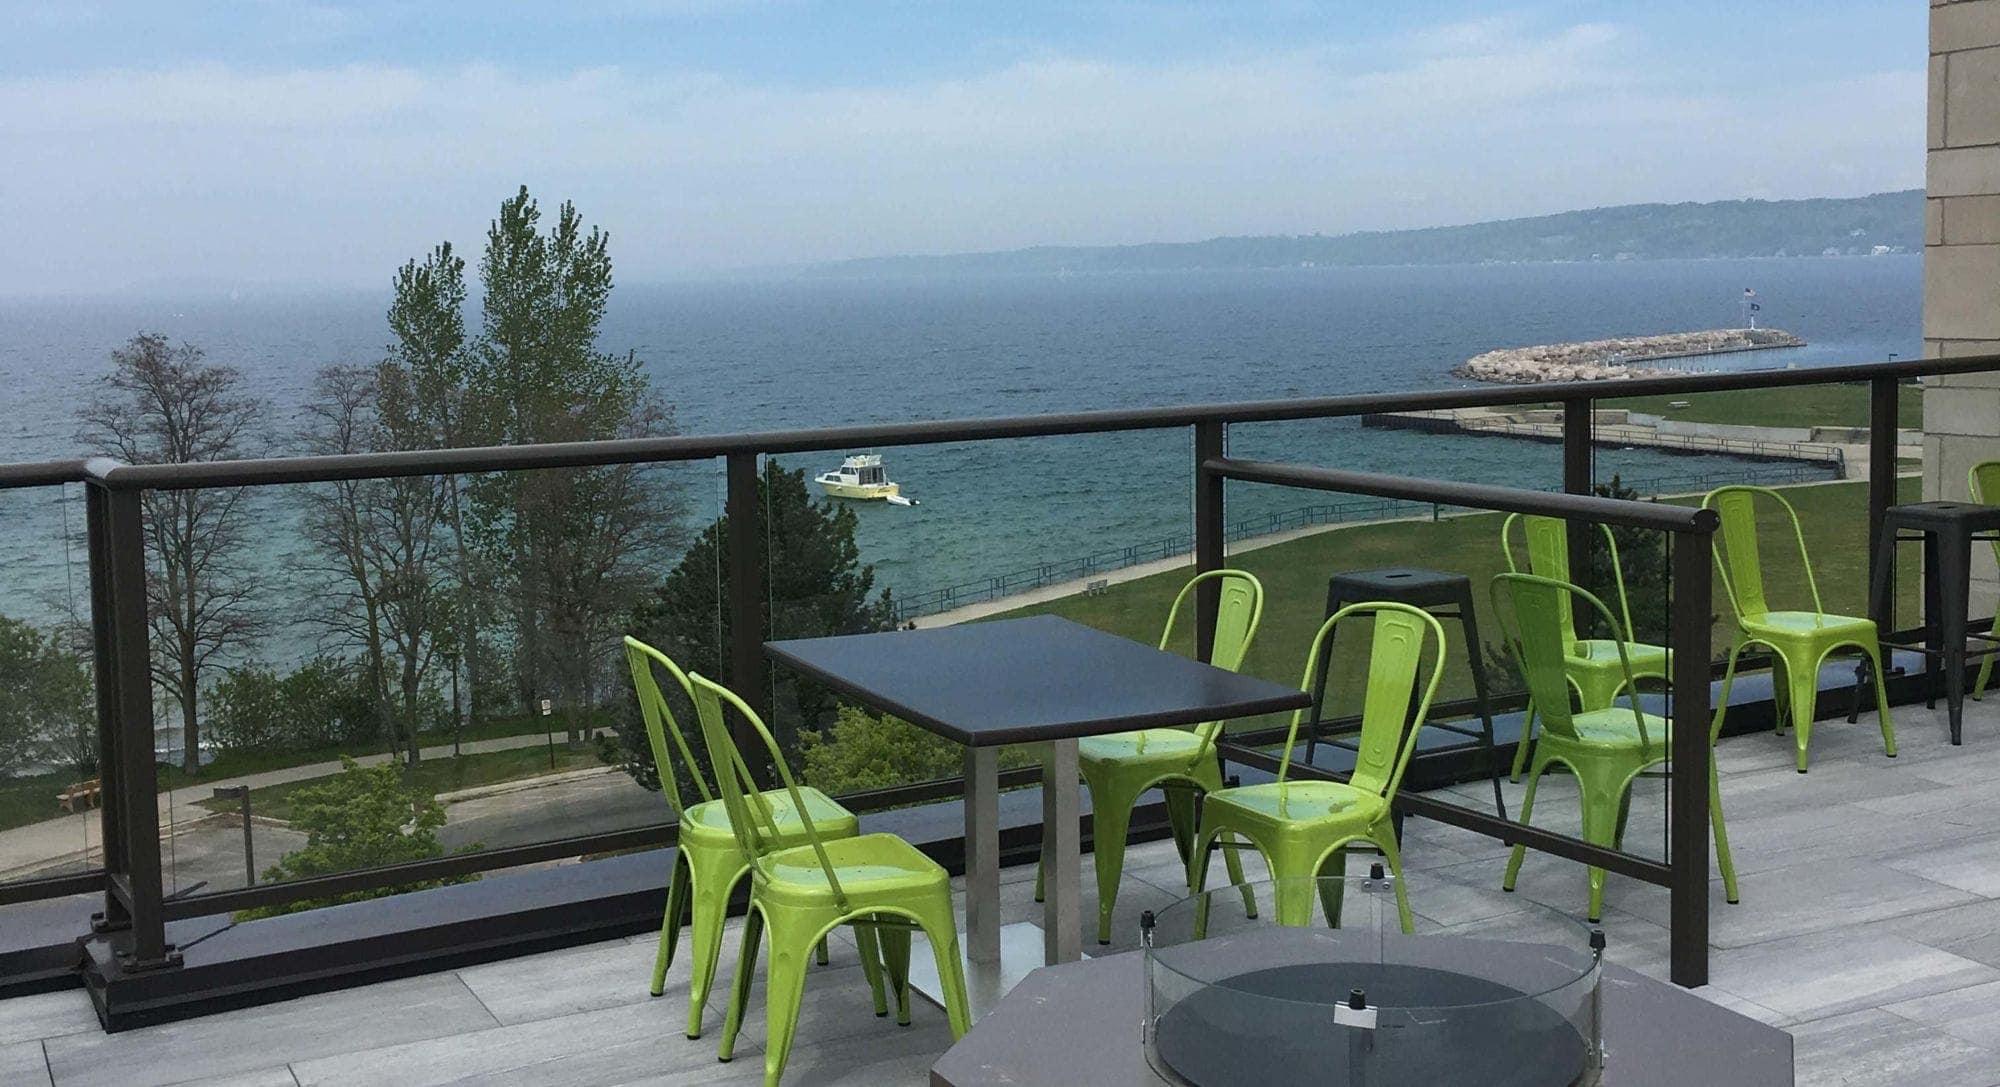 Hotel Indigo Traverse City Rooftop Bar Opens - MyNorth.com